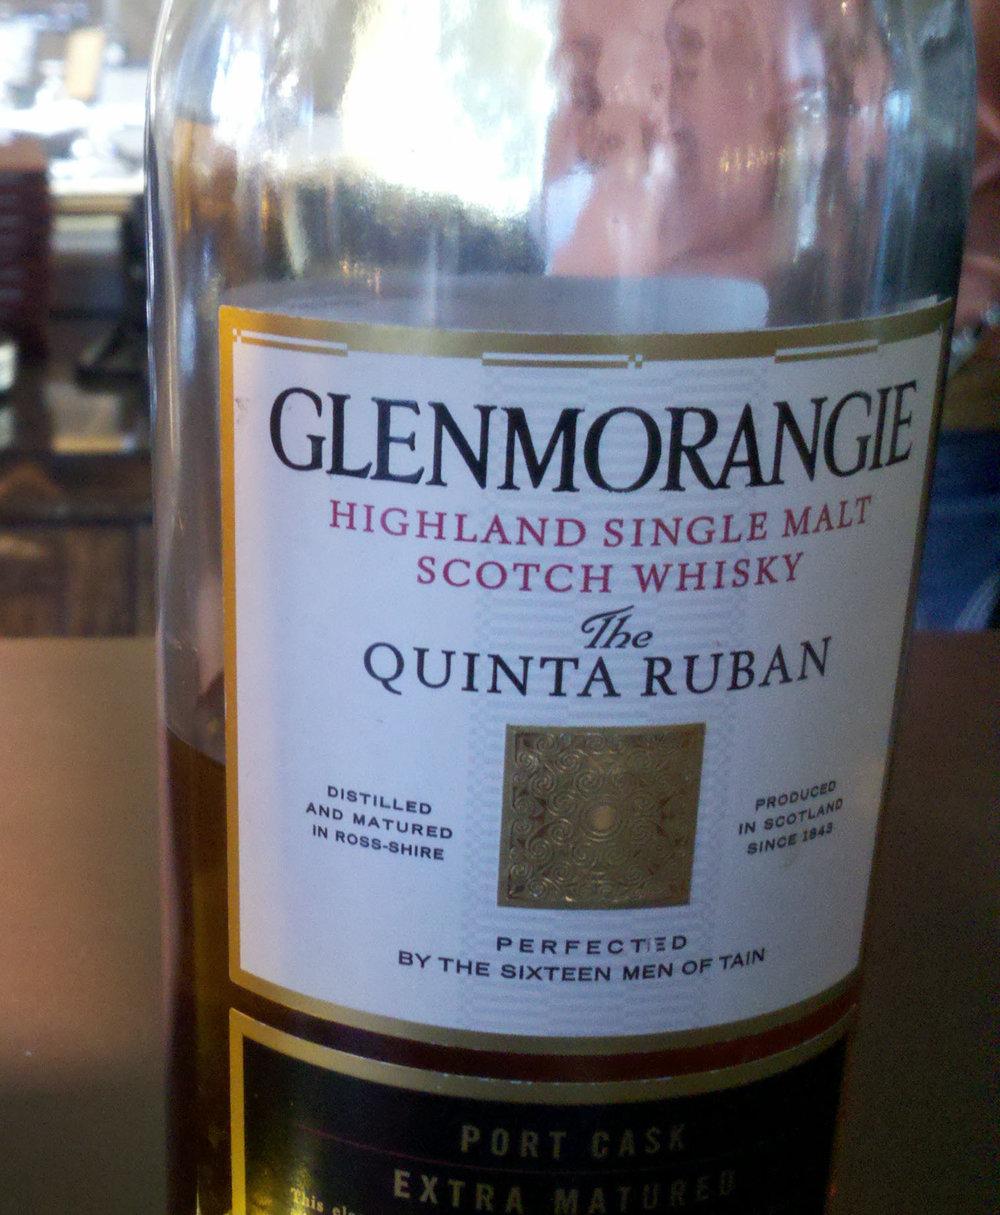 12 Year Old | 46% ABV - Distillery | Glenmorangie